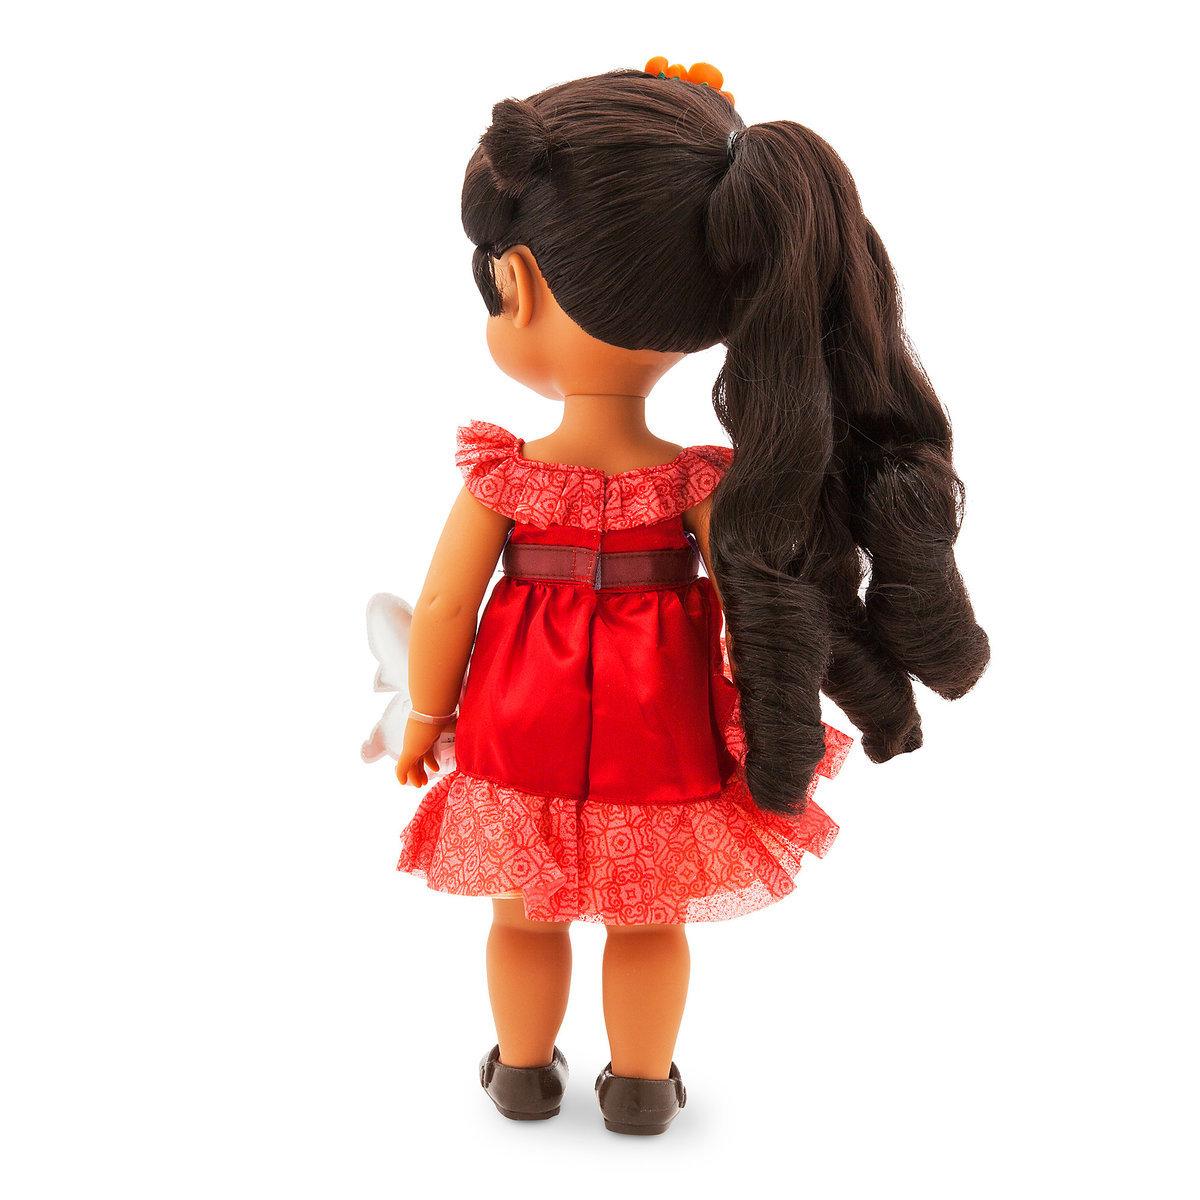 Disney Animators' Collection Elena of Avalor Doll - 16'' ของแท้ นำเข้าจากอเมริกา